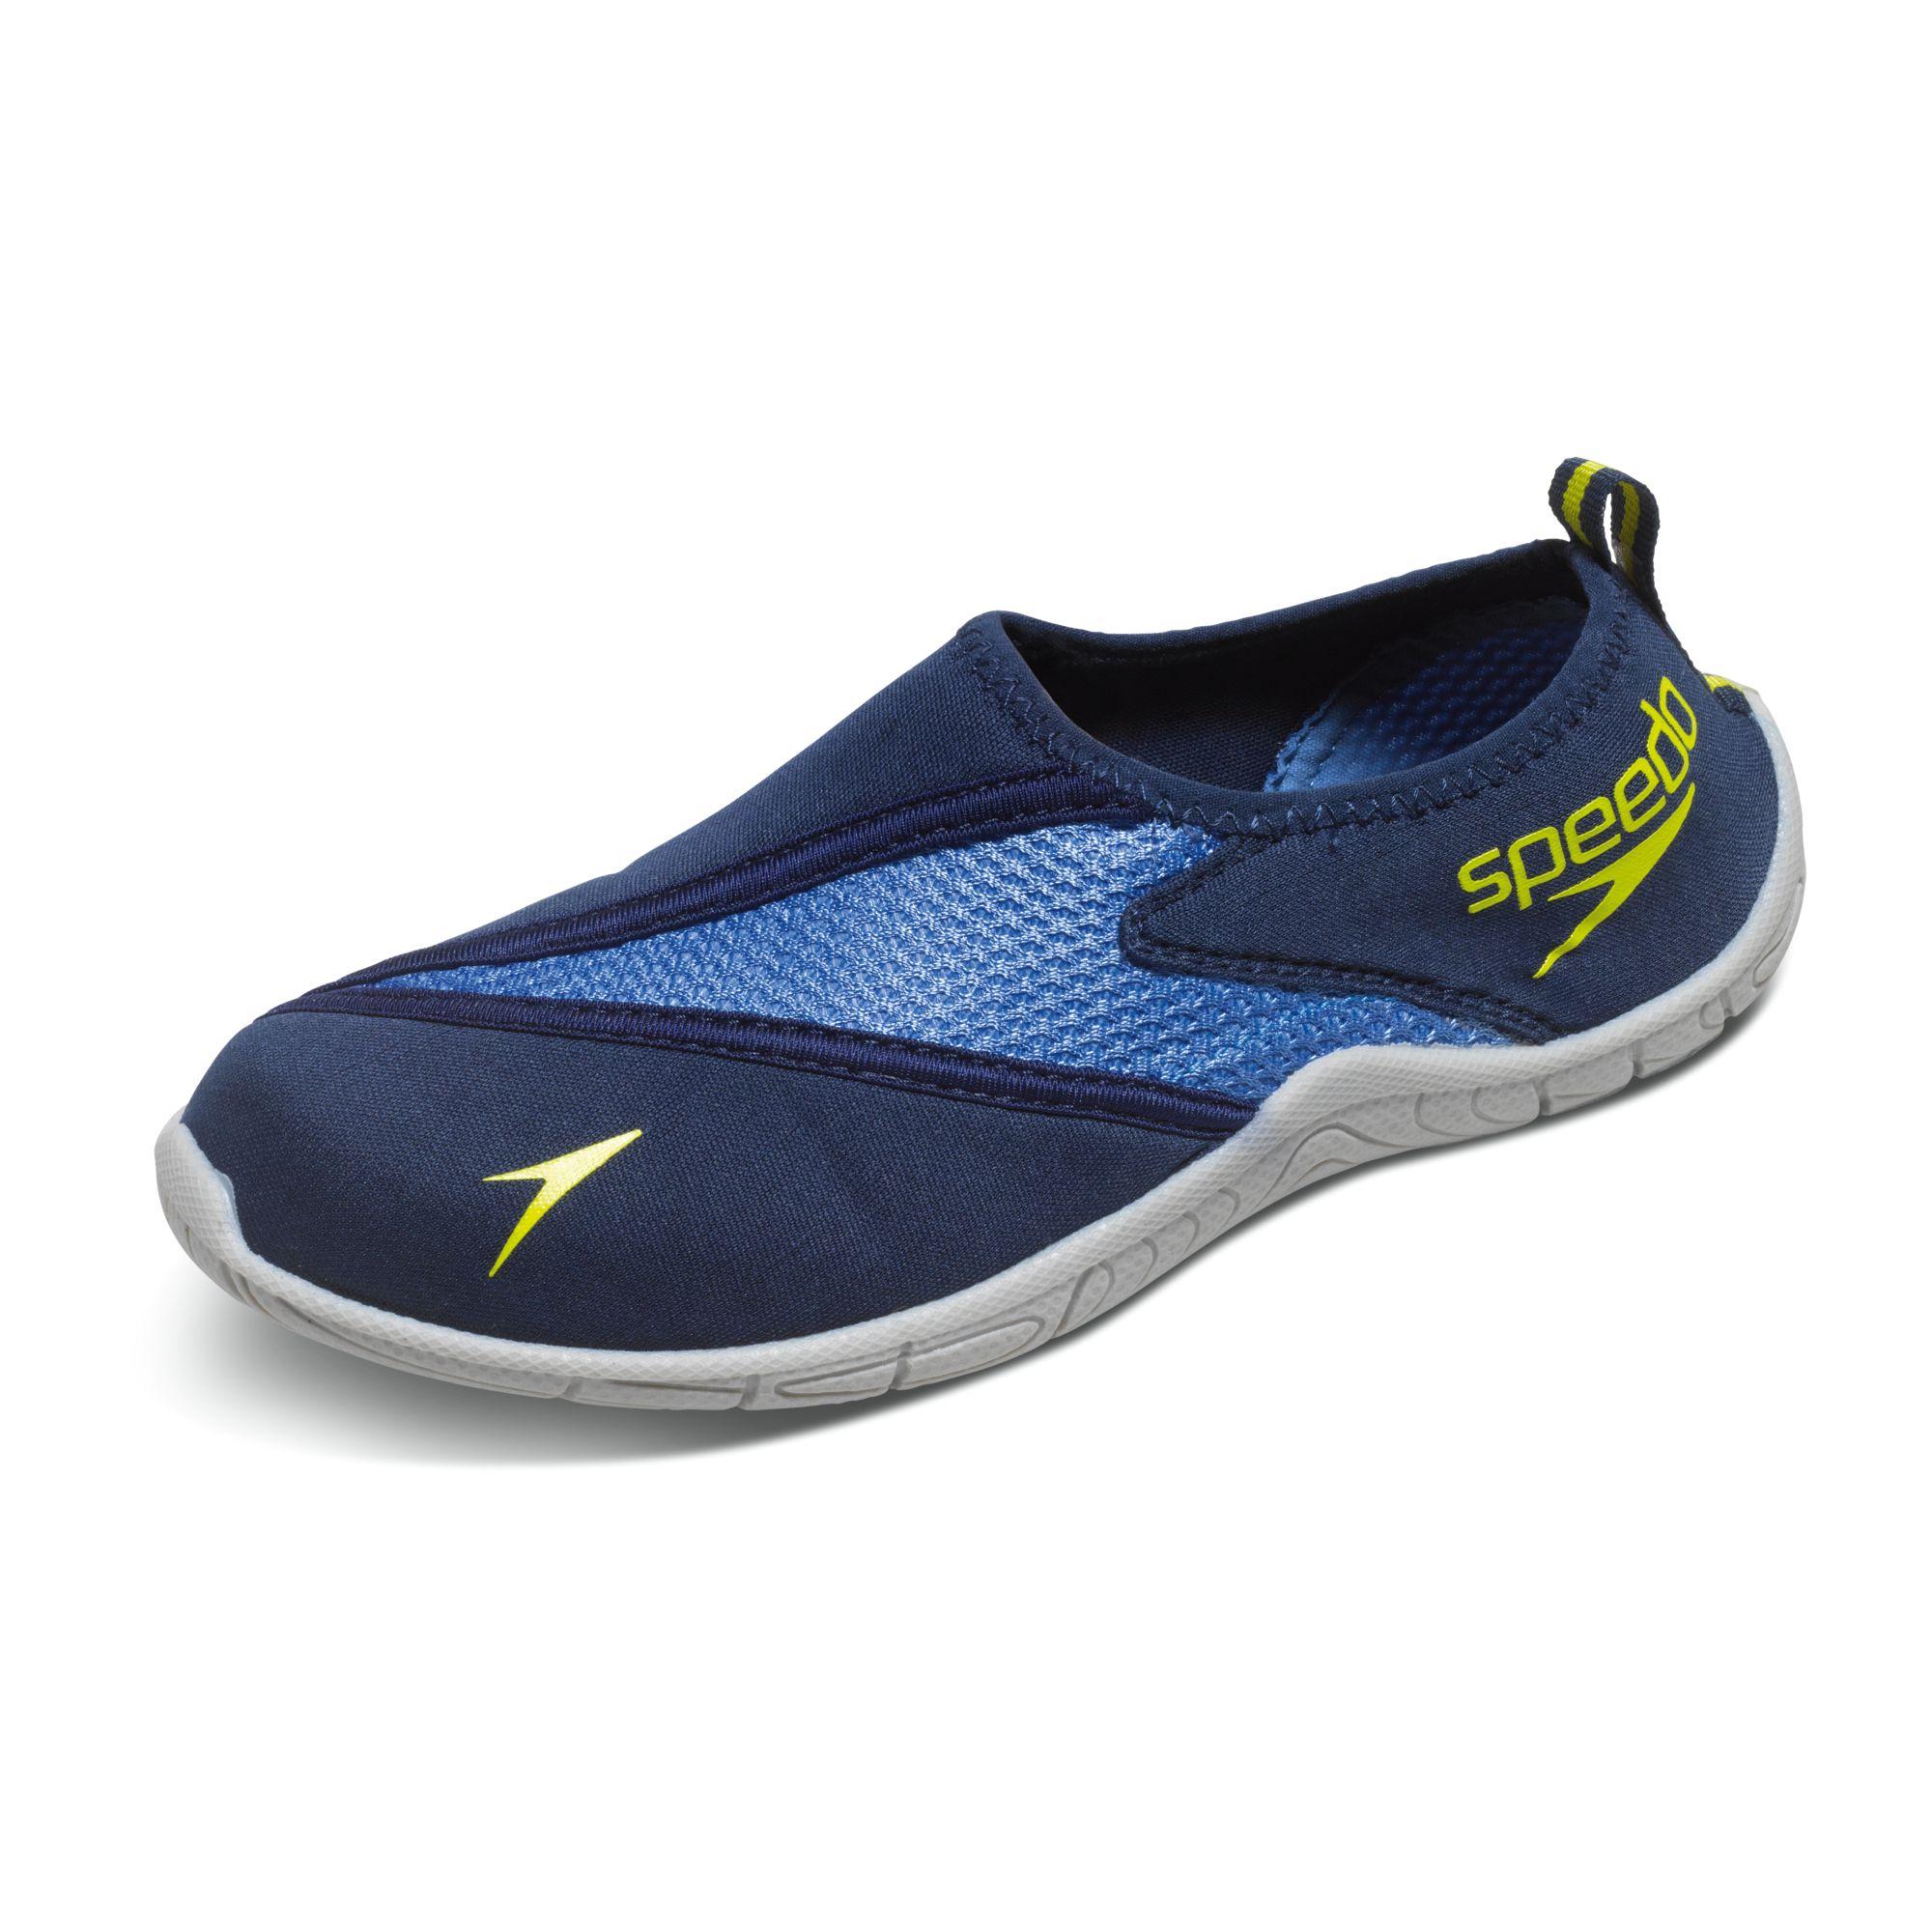 Speedo Women S Beachrunner   Water Shoes Size